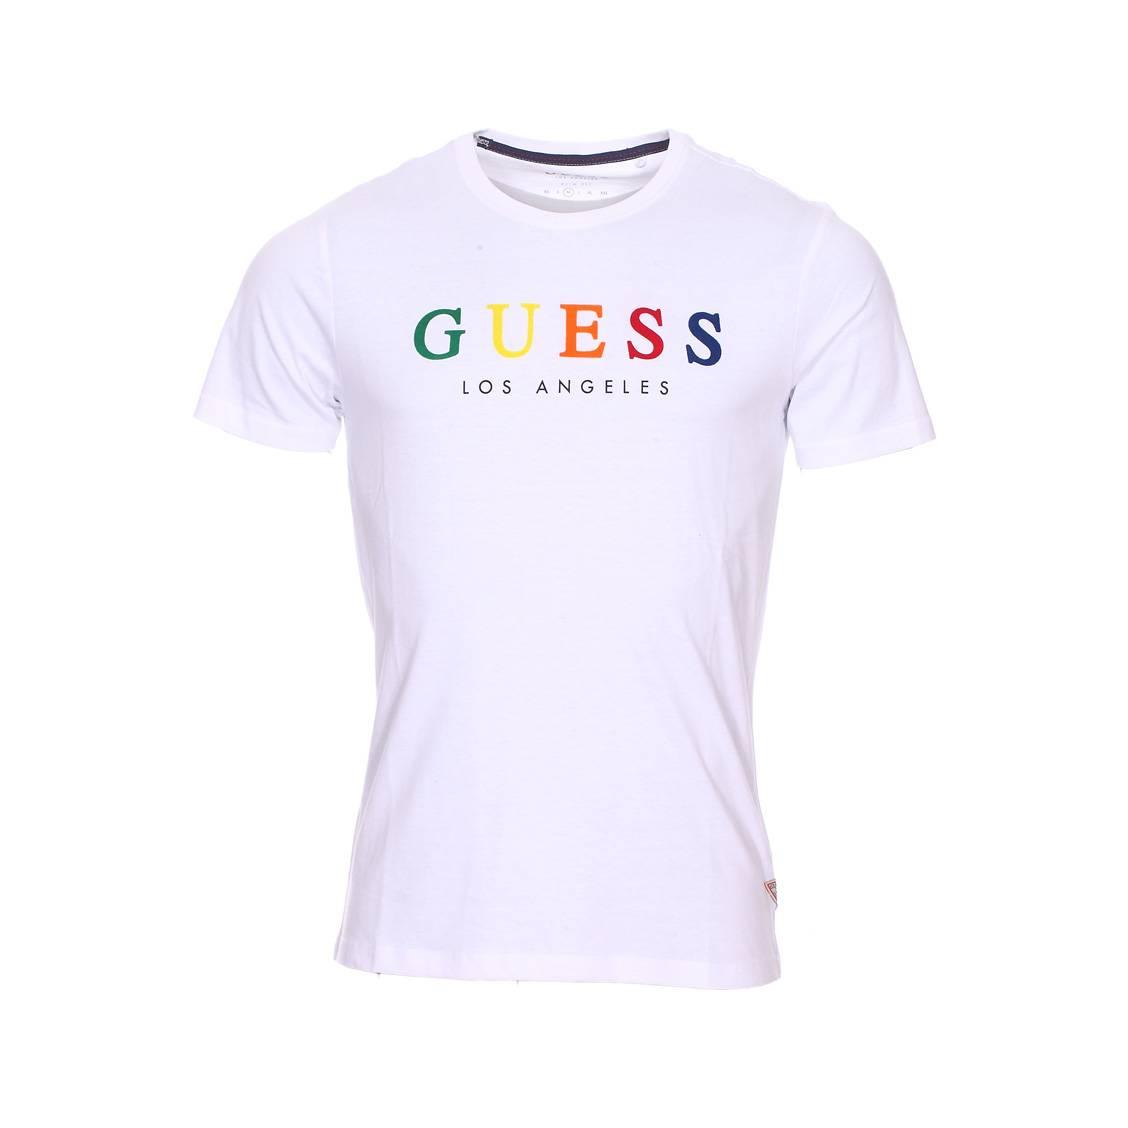 Tee-shirt guess en coton blanc floqué